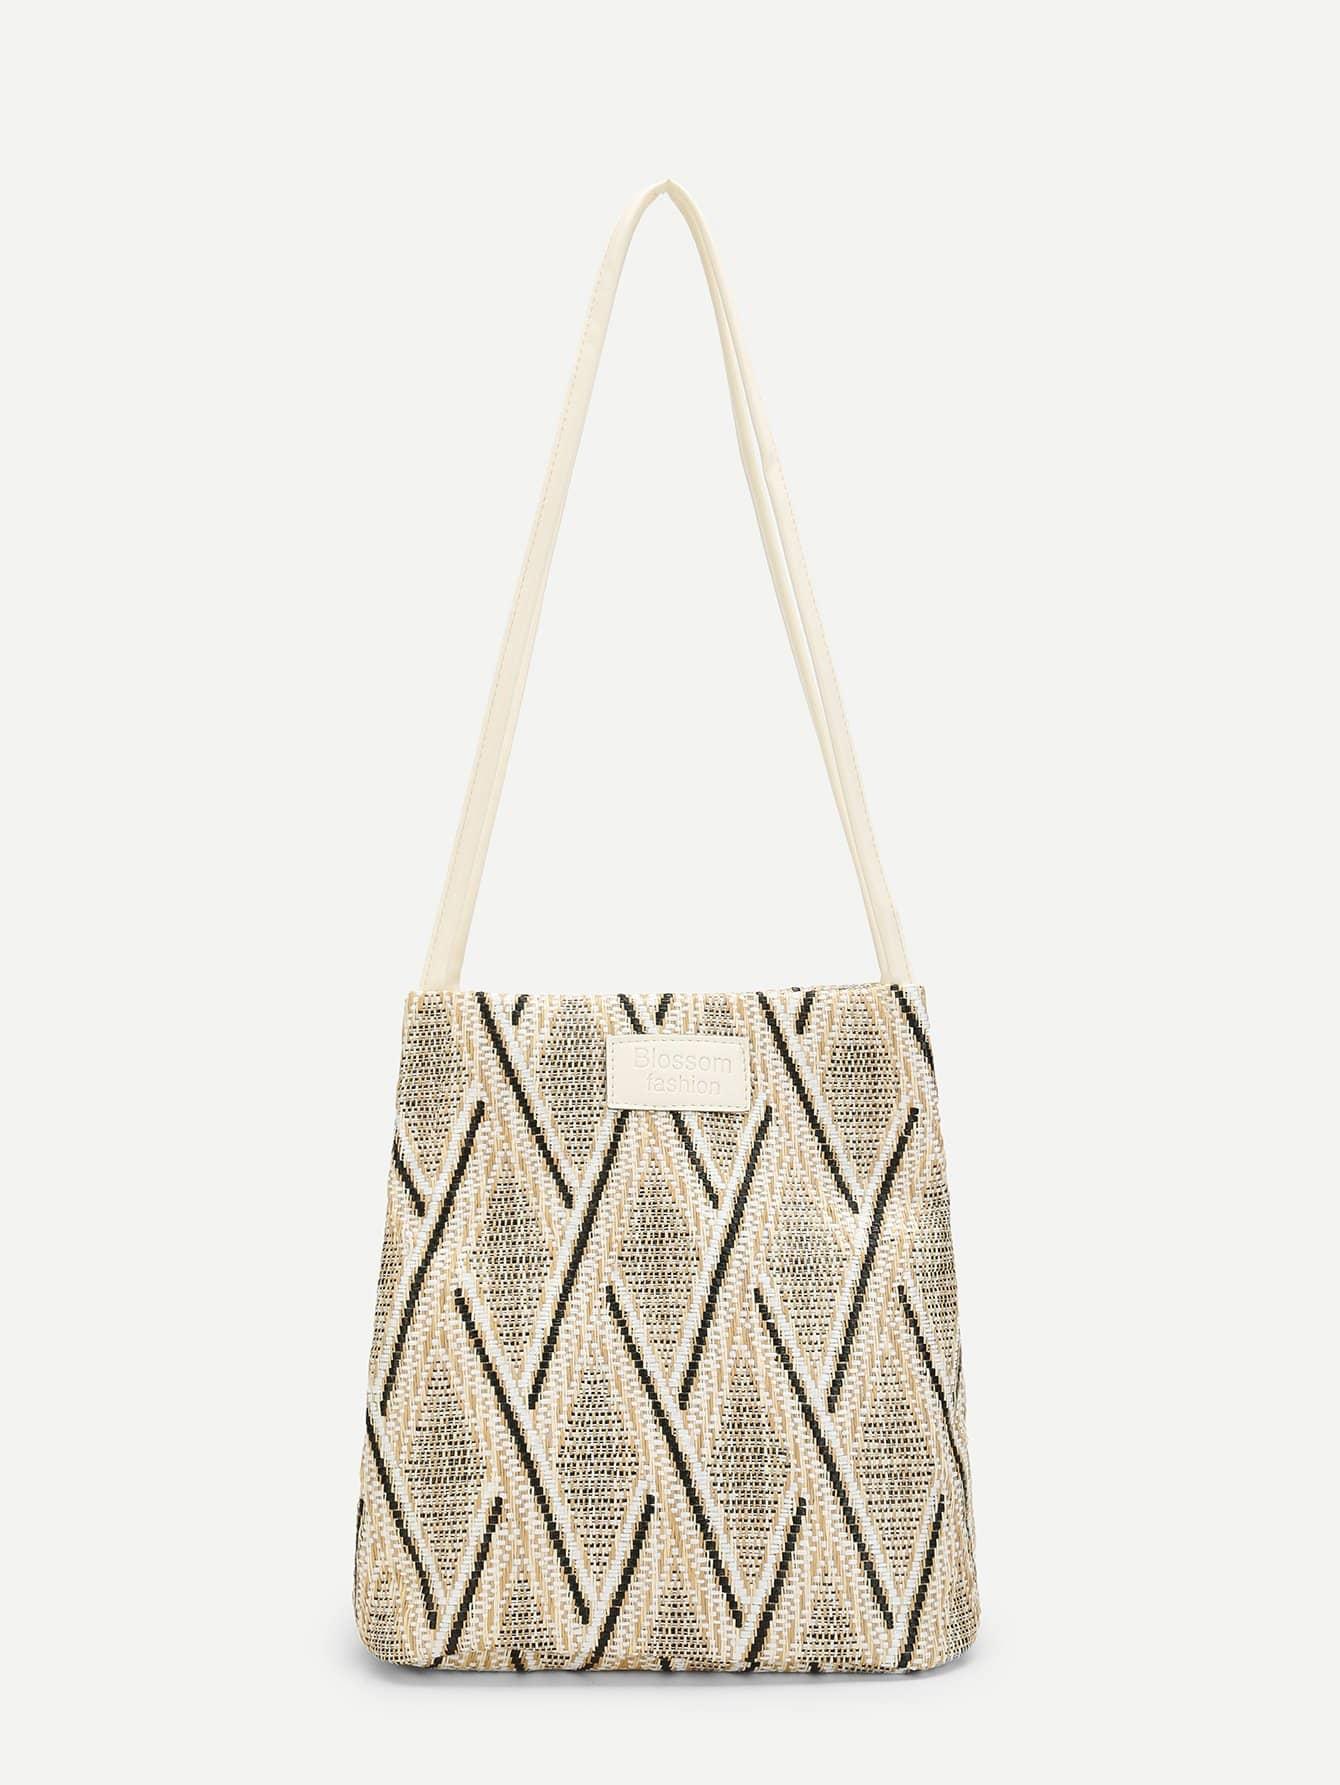 Diamond Laser Cut Woven Bag